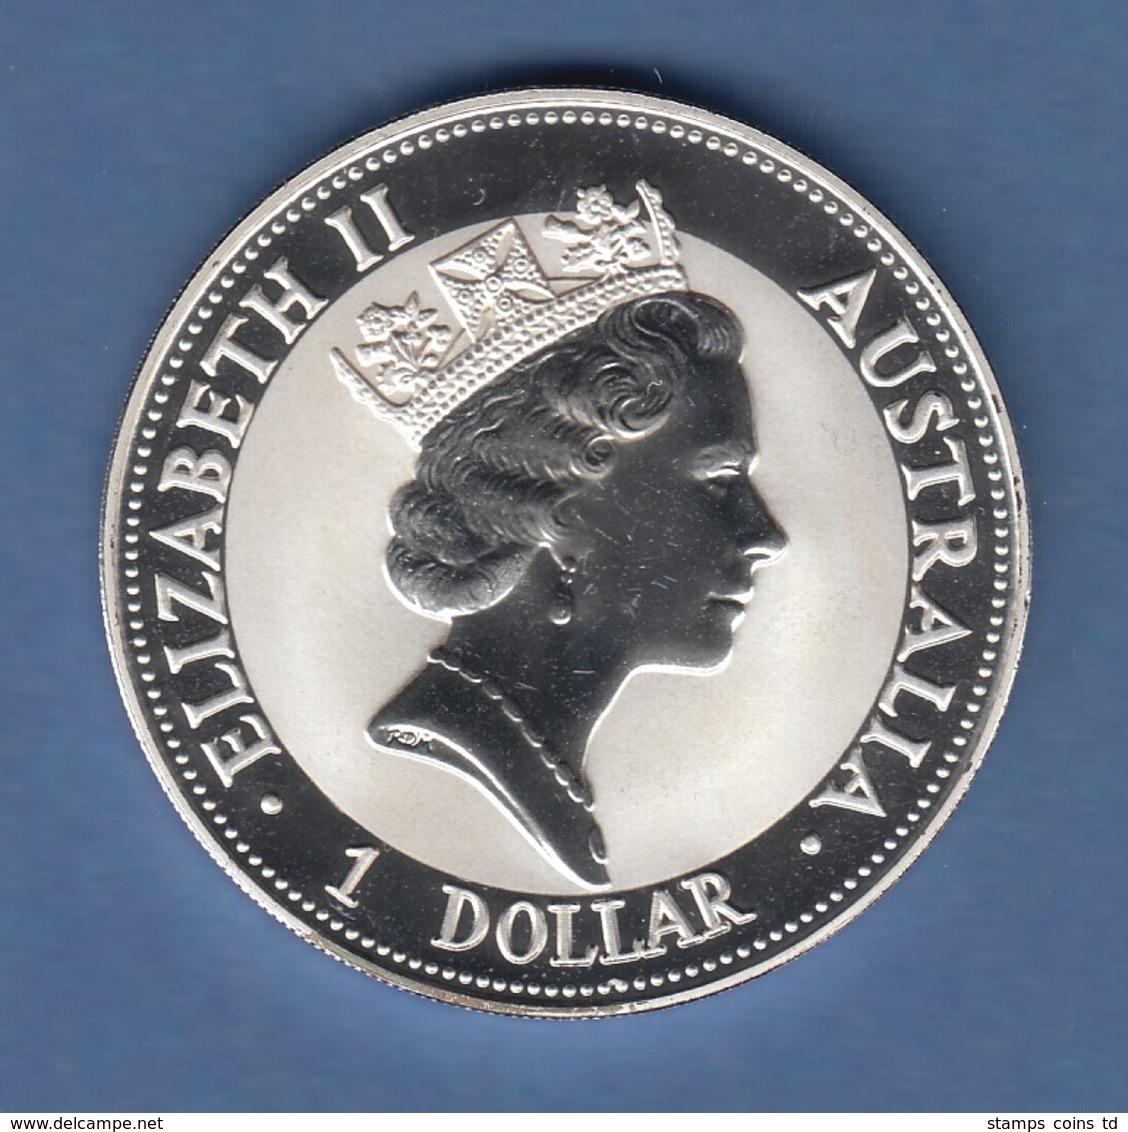 Australien 1992 Silber-Anlagemünze Kookaburra 1 Unze Ag999 - Monete